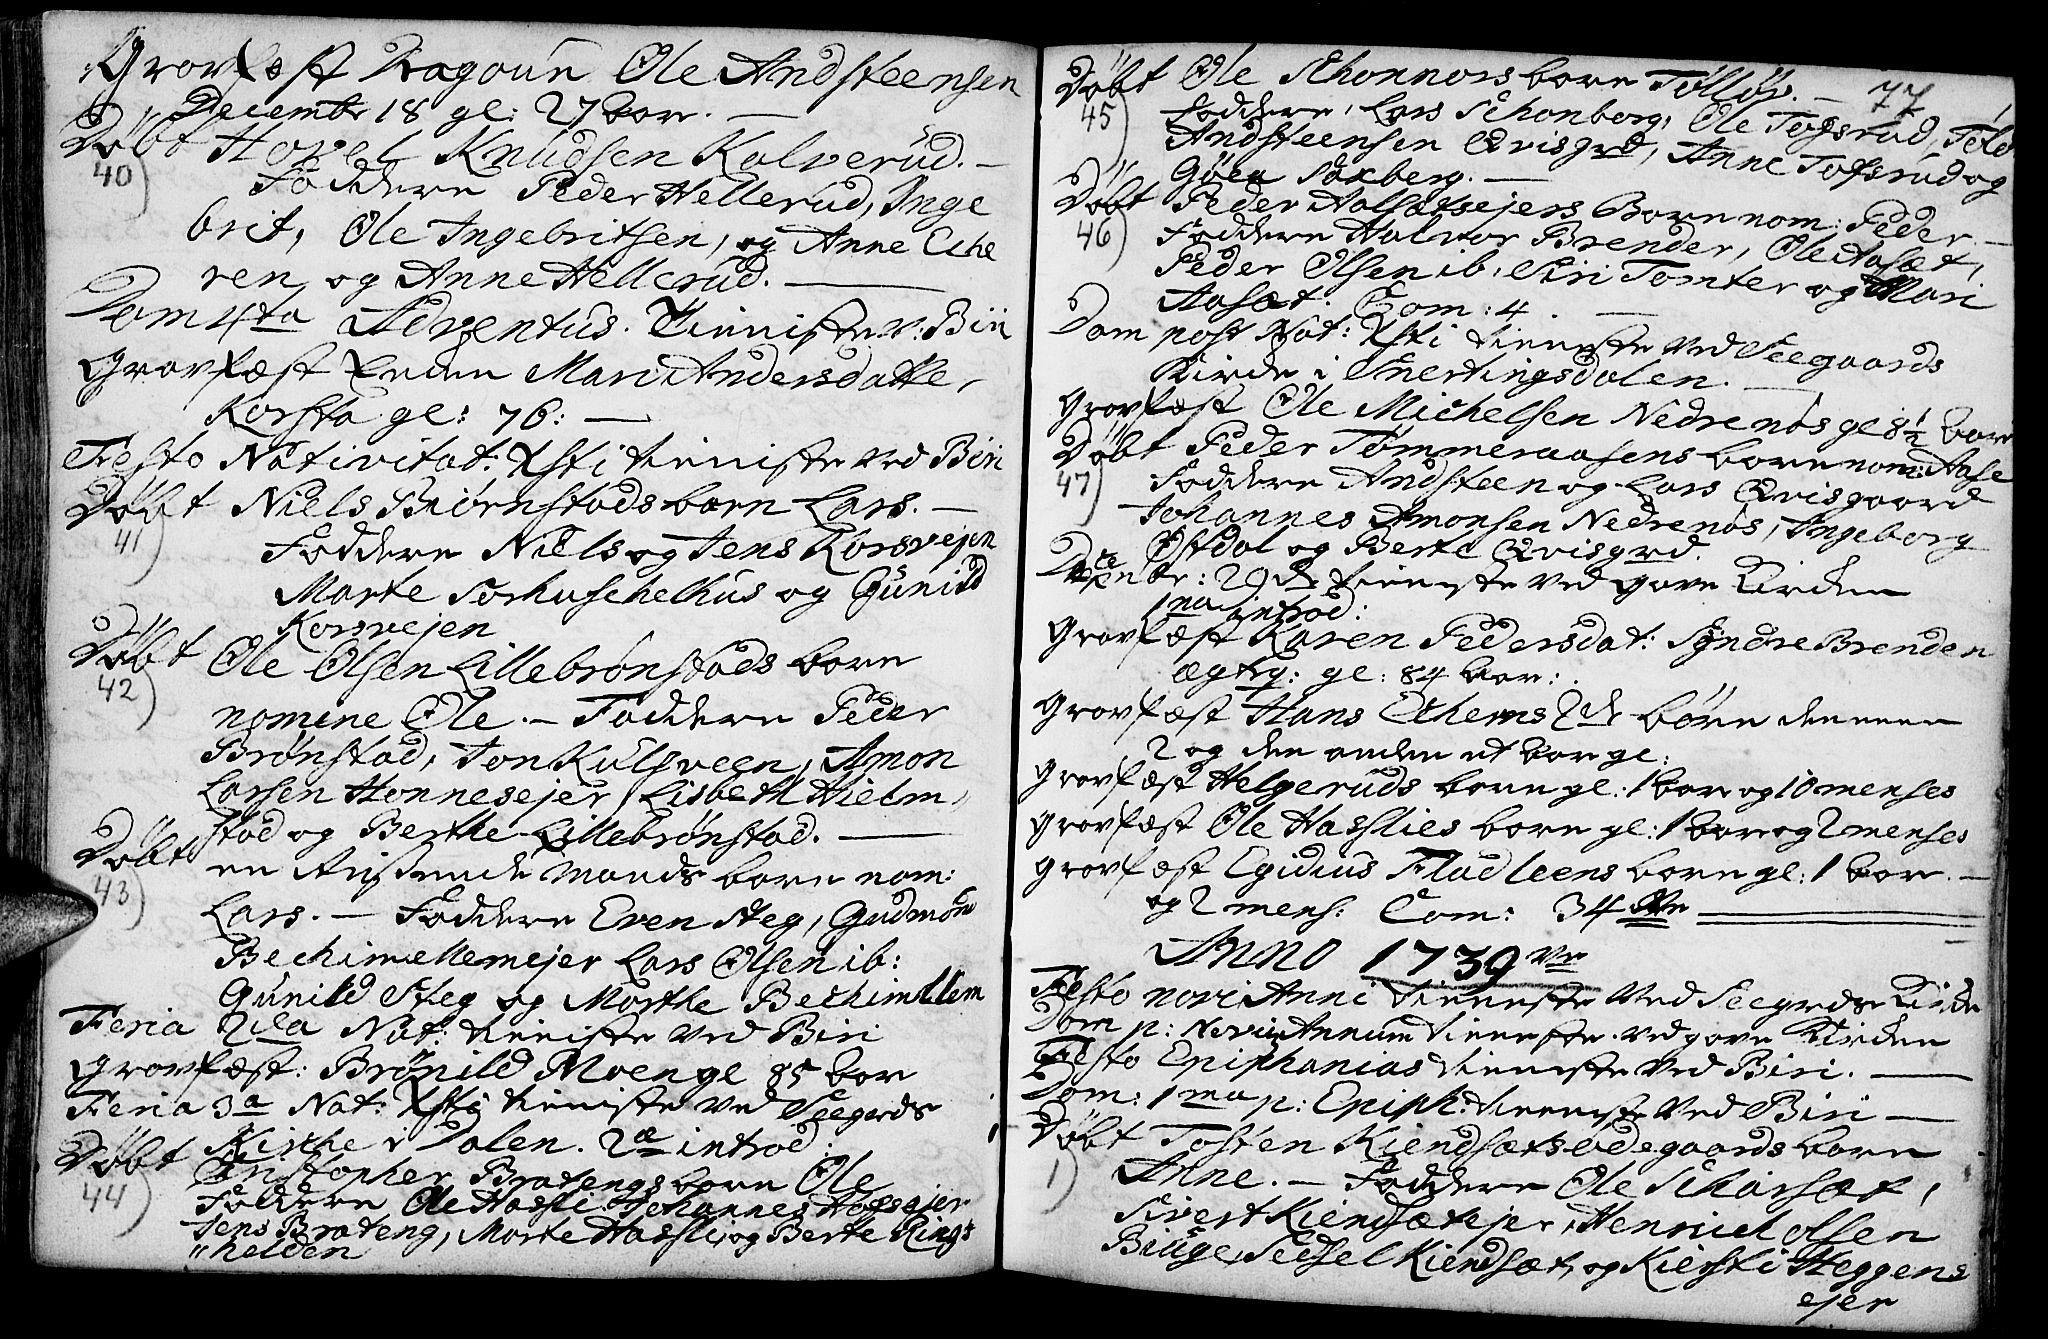 SAH, Biri prestekontor, Parish register (official) no. 1, 1730-1754, p. 77